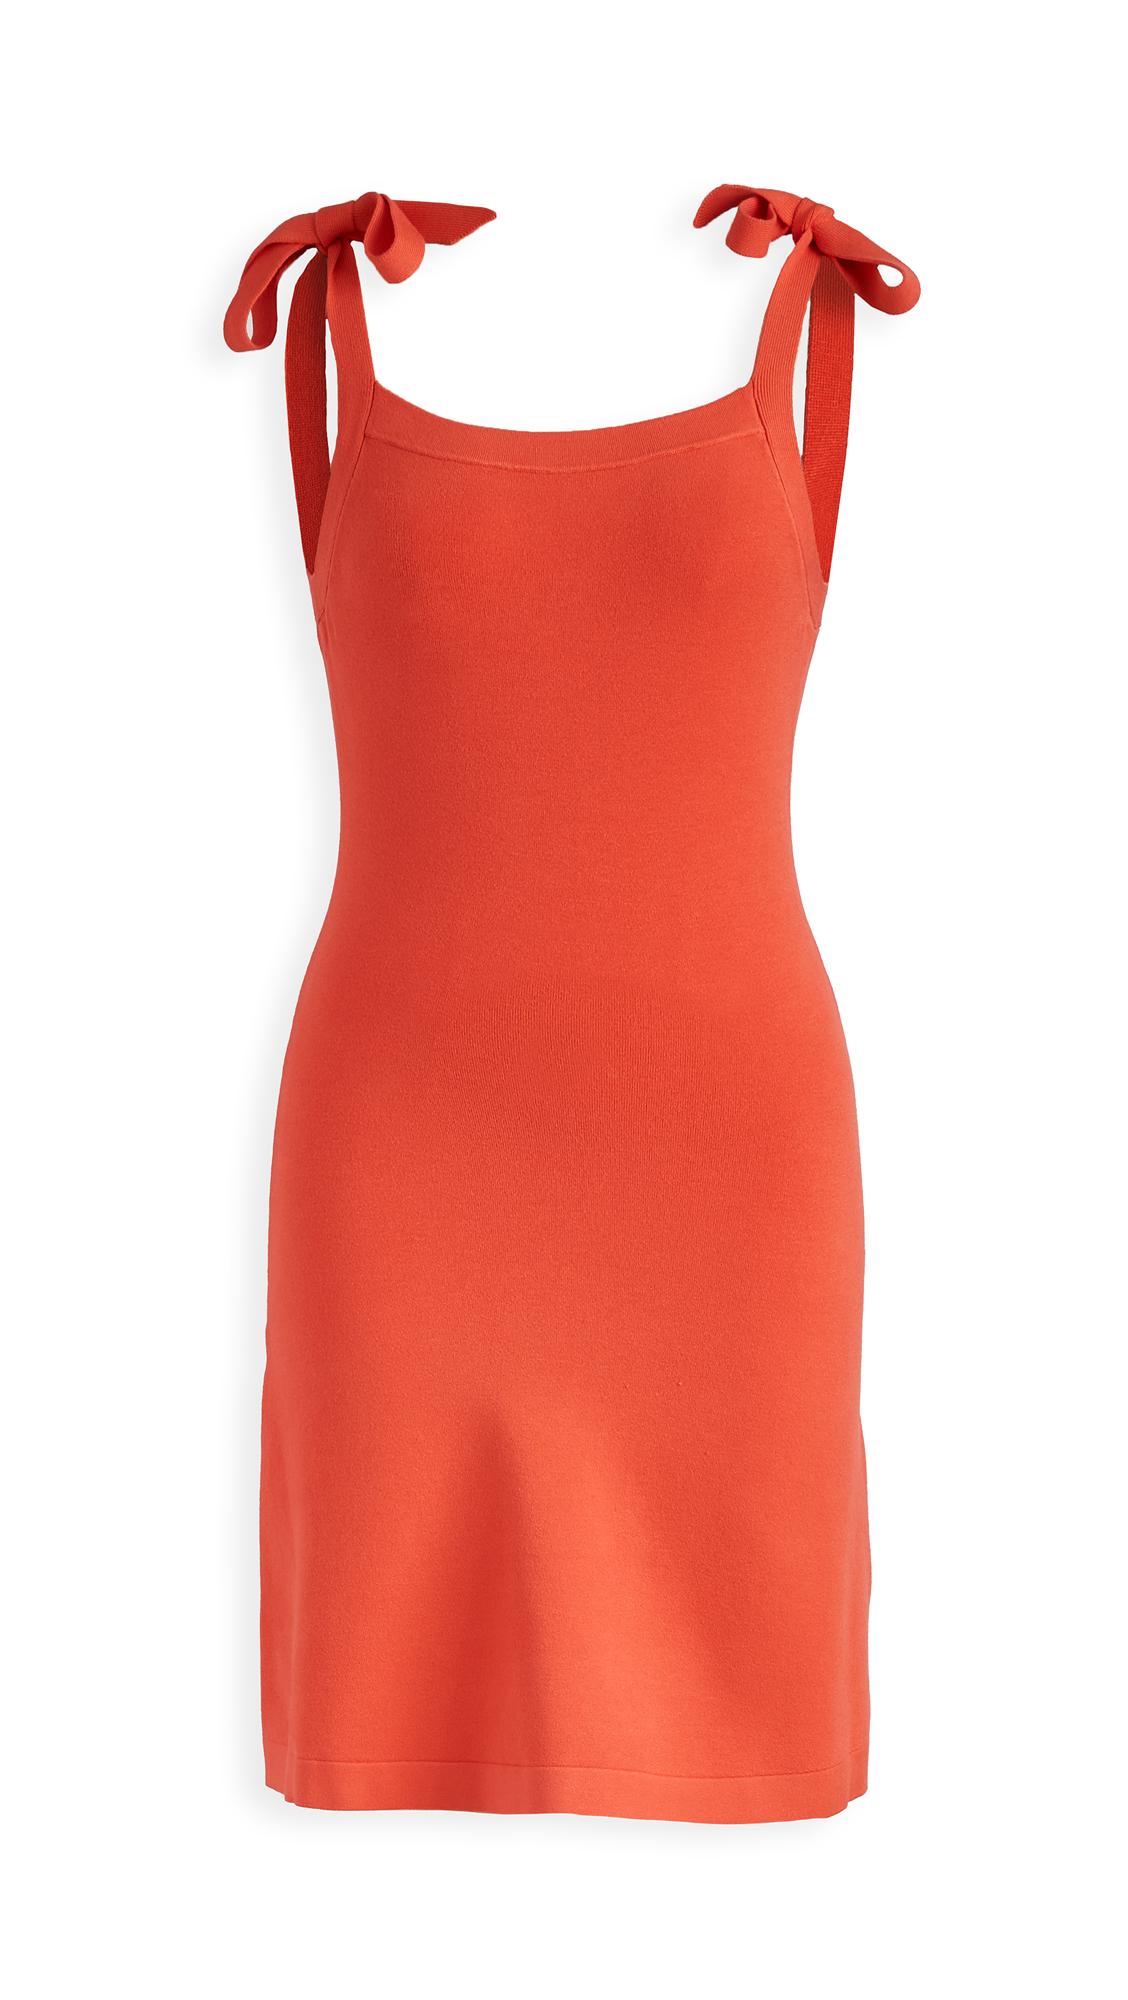 JoosTricot Camisole Dress